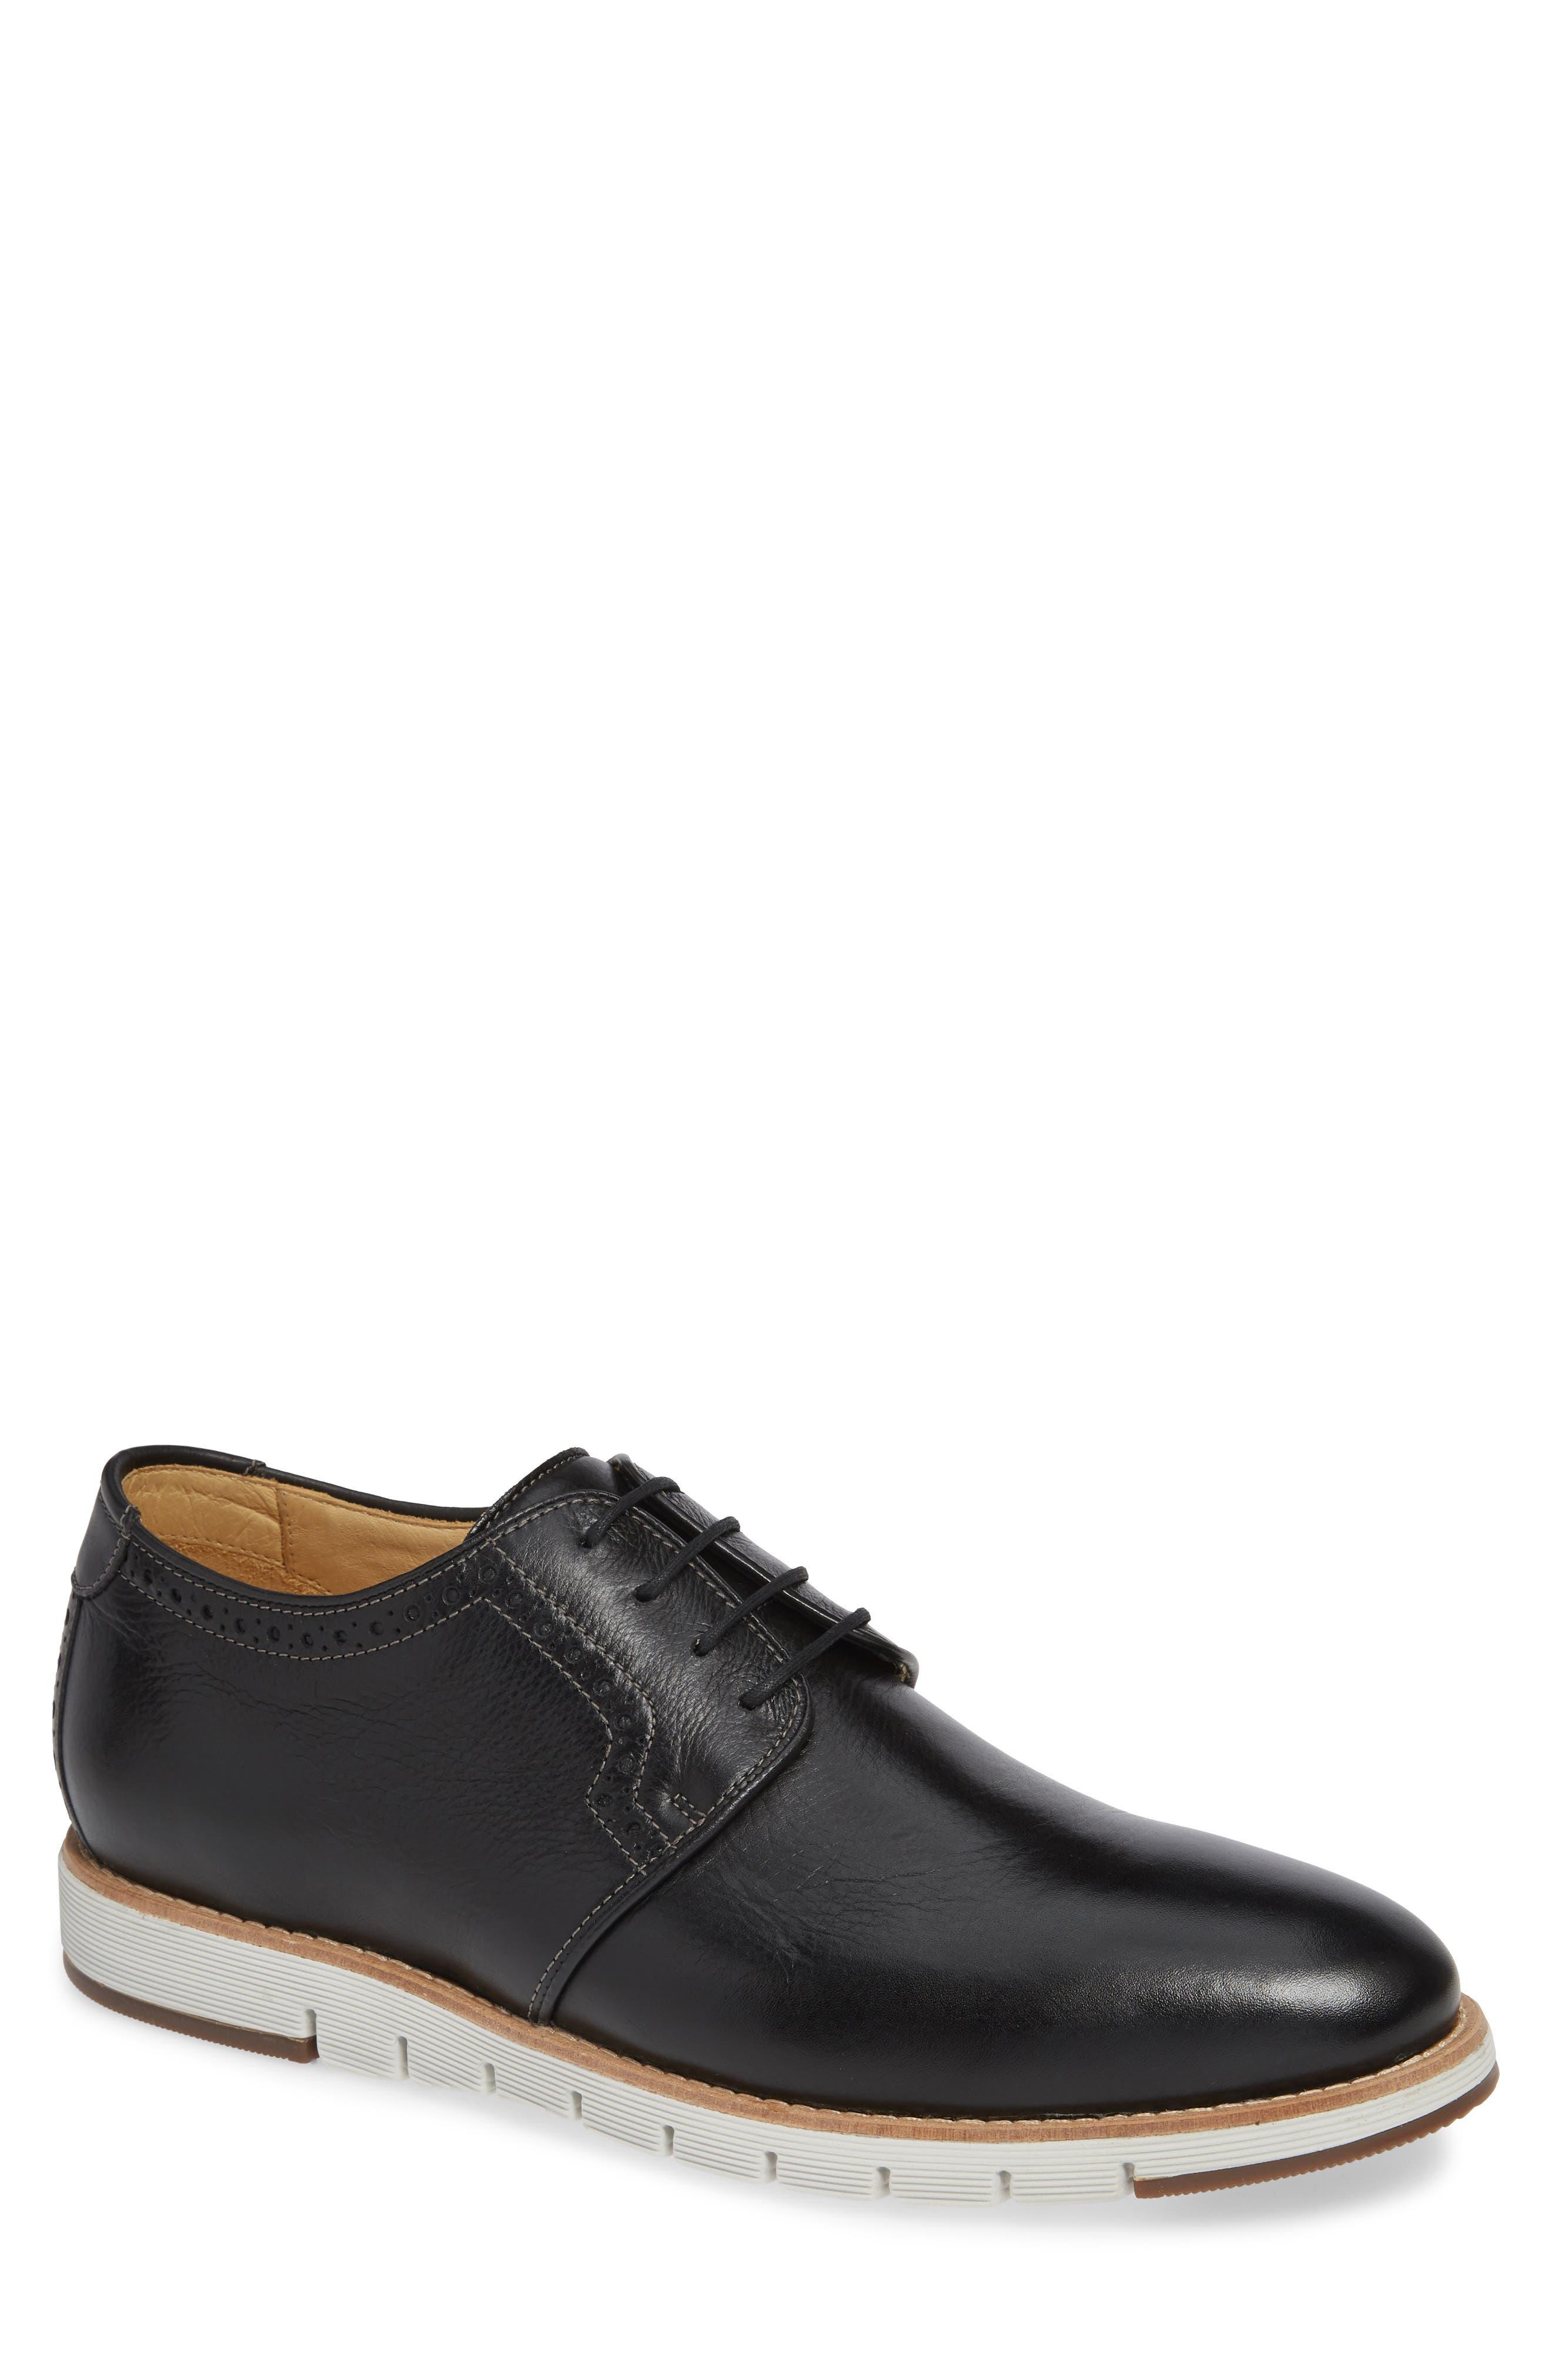 Martell Plain Toe Derby,                         Main,                         color, BLACK LEATHER